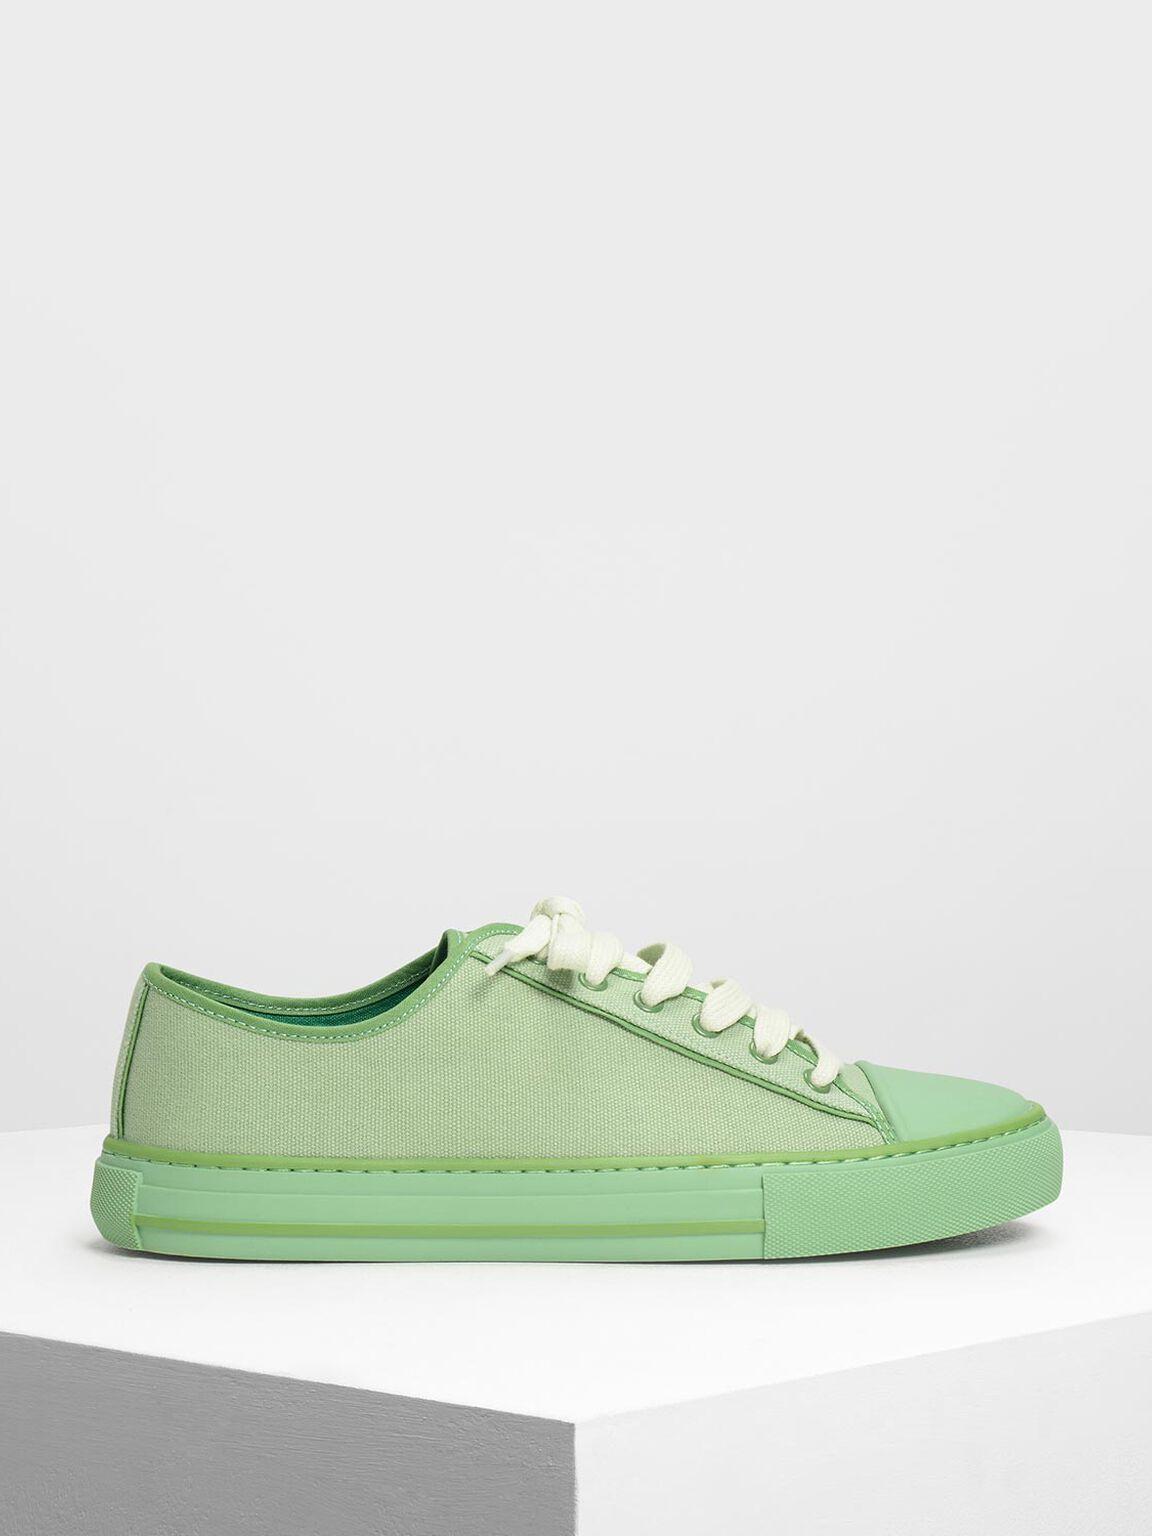 糖果色系帆布鞋, 灰綠色, hi-res